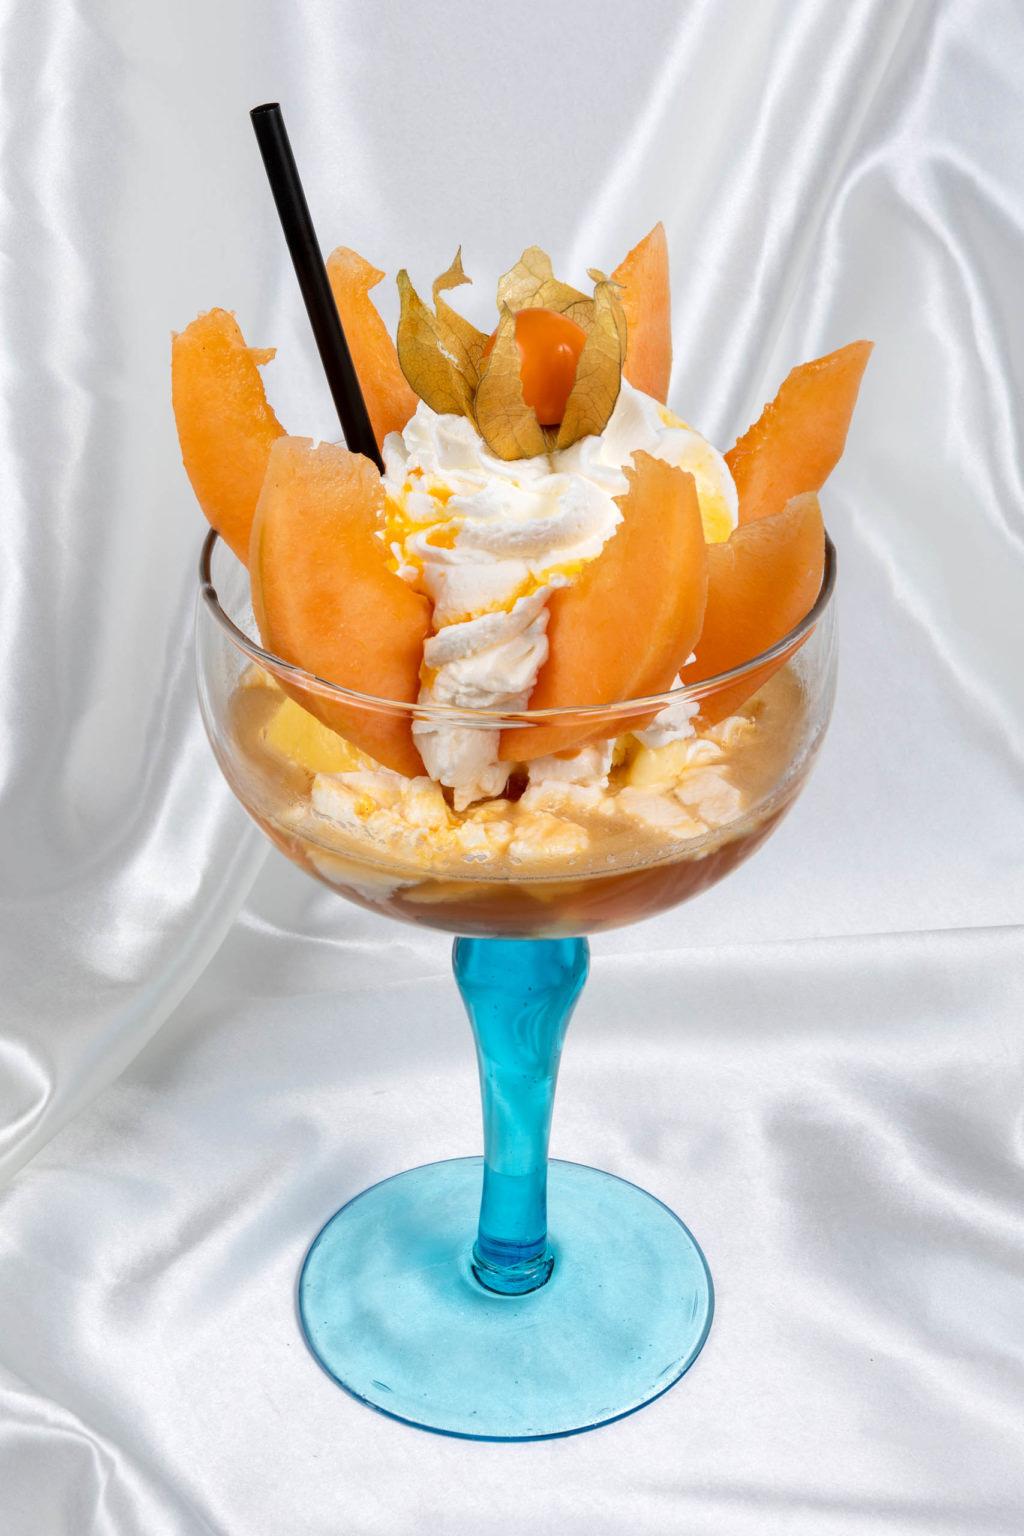 Immagini Food Ice Cream Fotografo